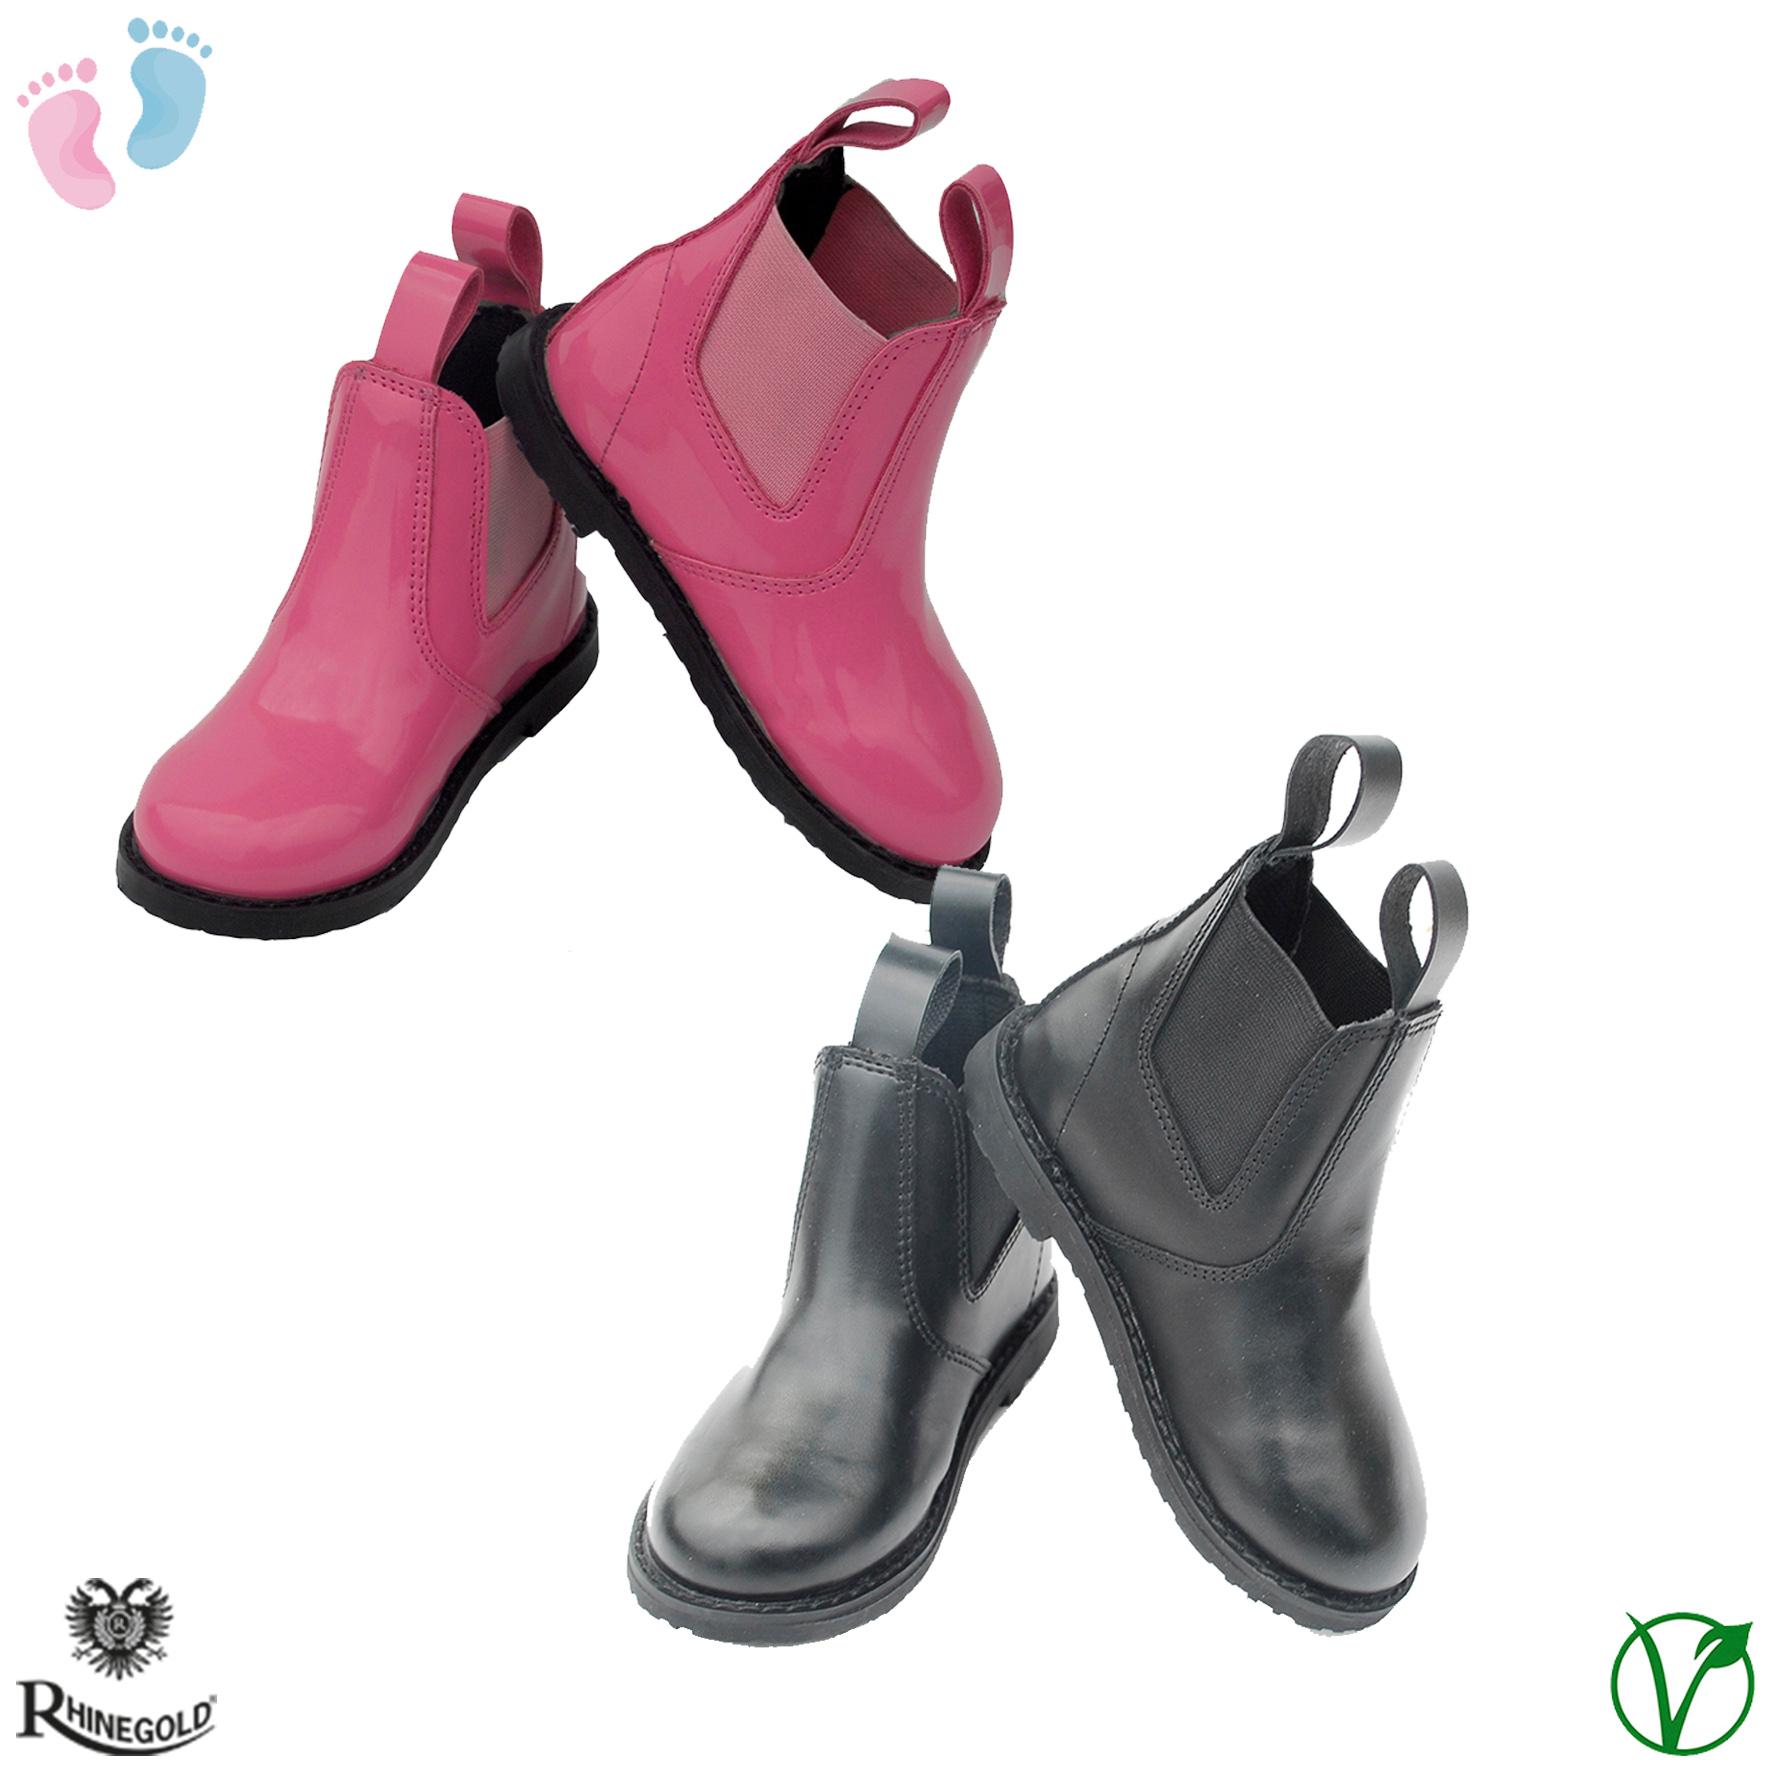 Rhinegold Little Ones Jodhpur Boots